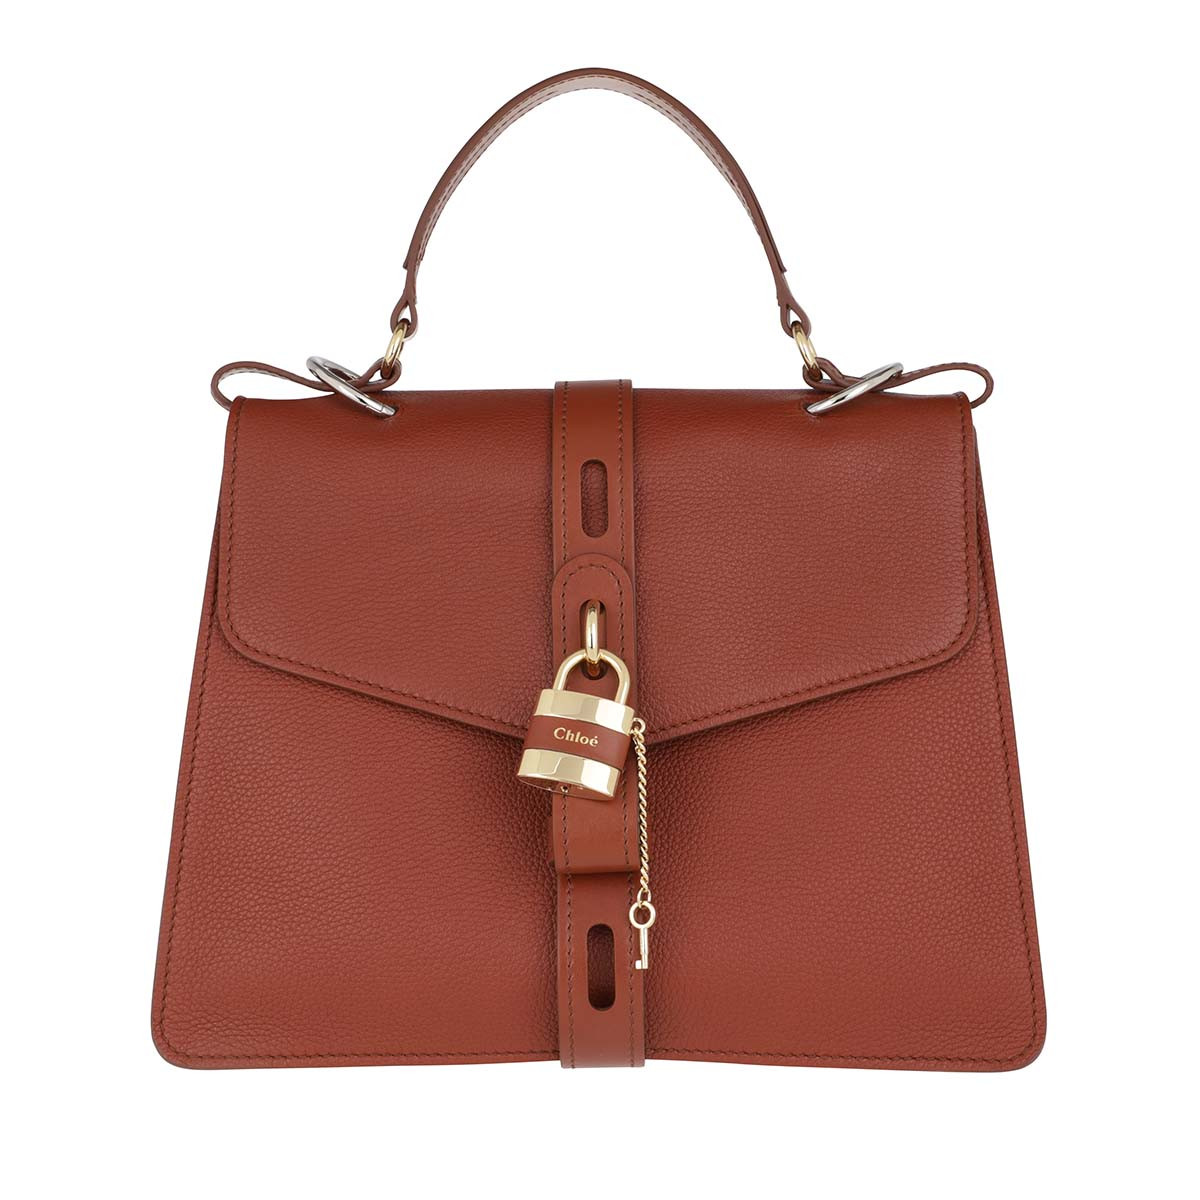 Chloé Satchel Bag - Aby Shoulder Bag Large Leather Sepia Brown - in braun - für Damen